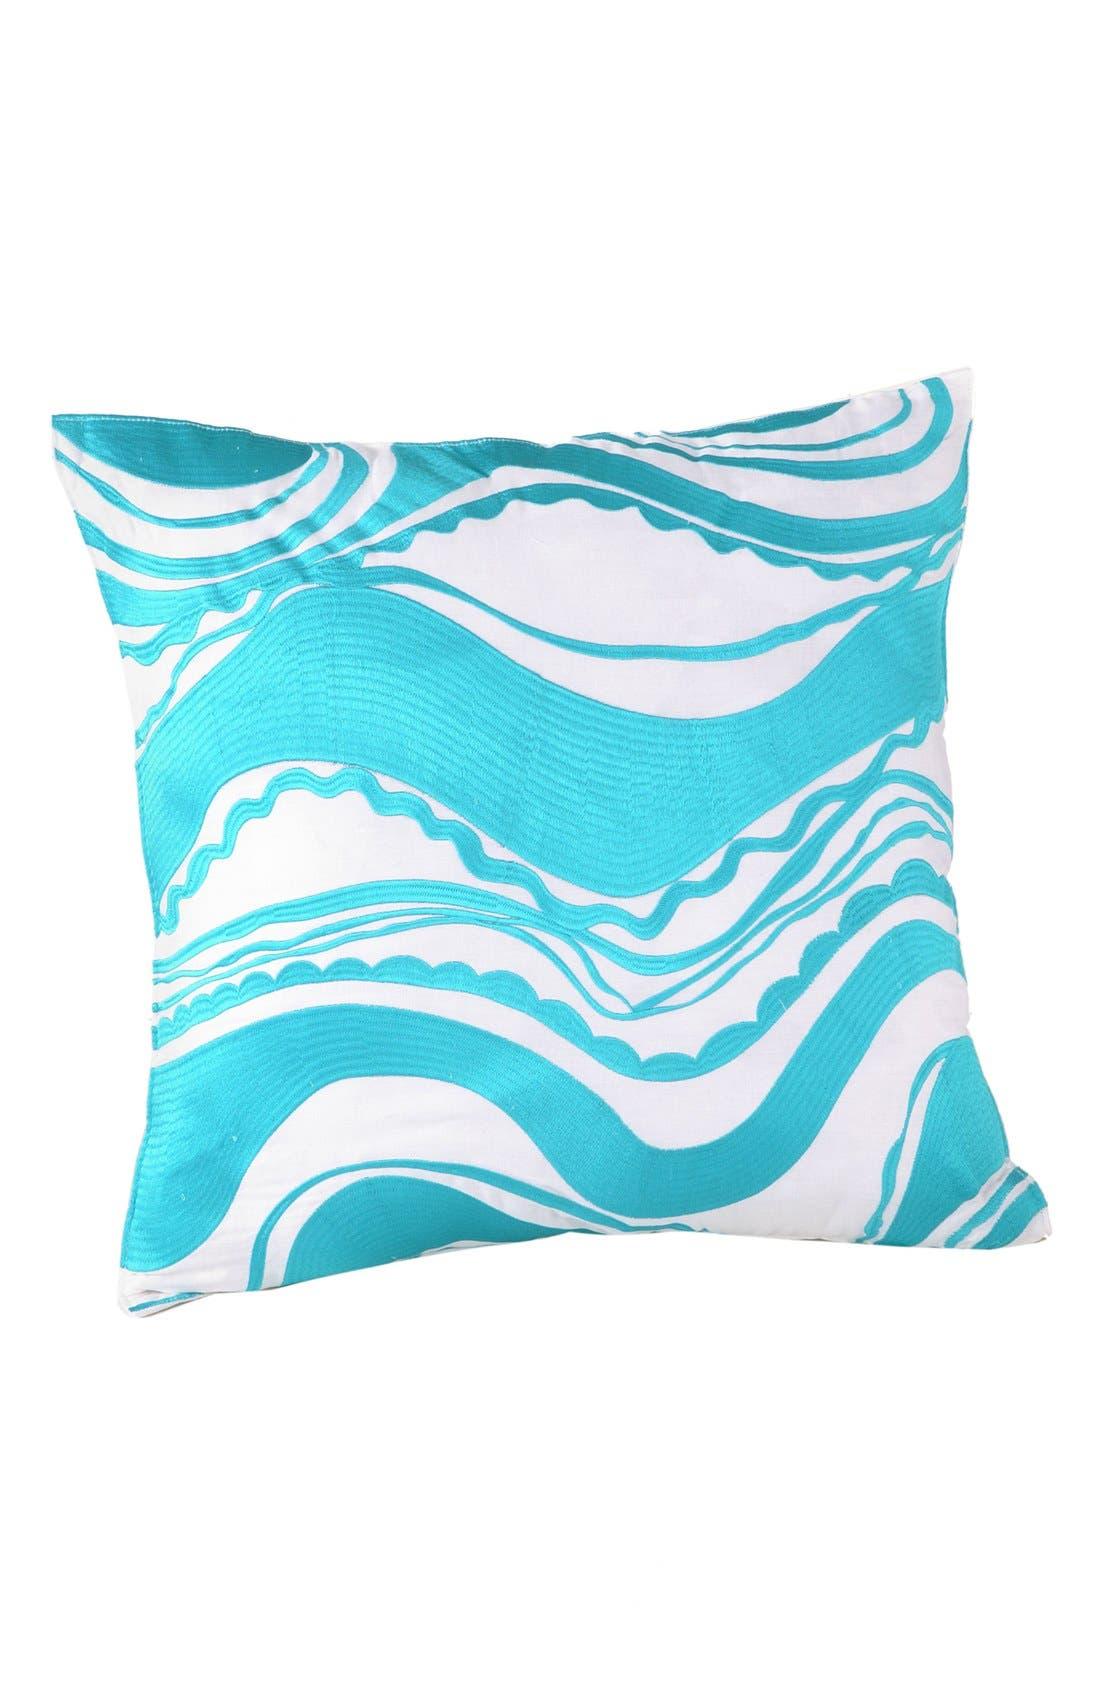 Main Image - Trina Turk 'Horizon Stripe' Pillow